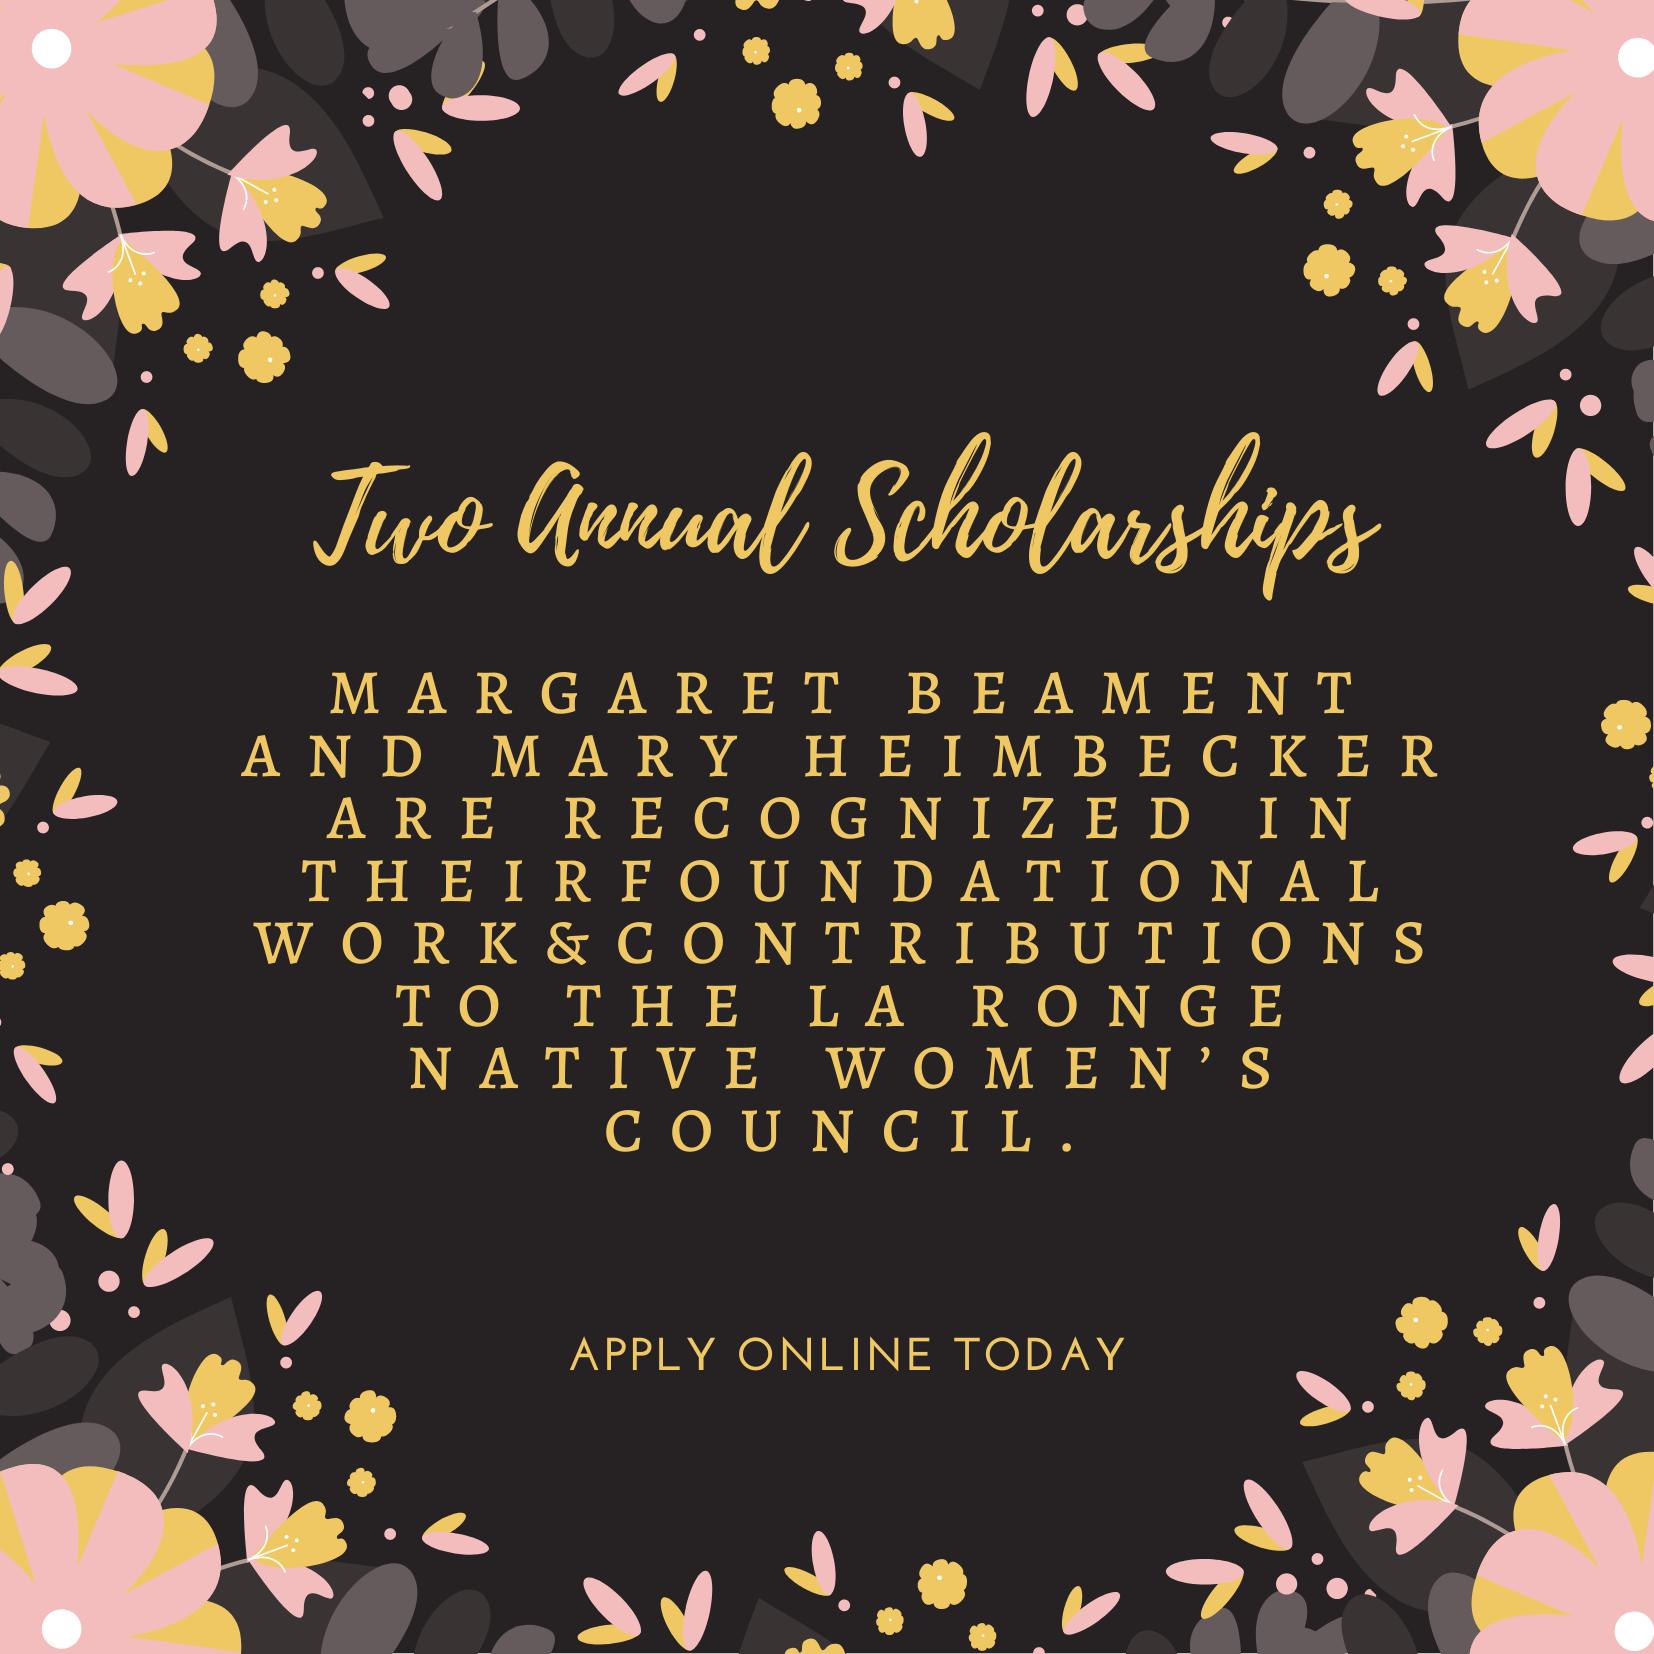 Two Scholarships!